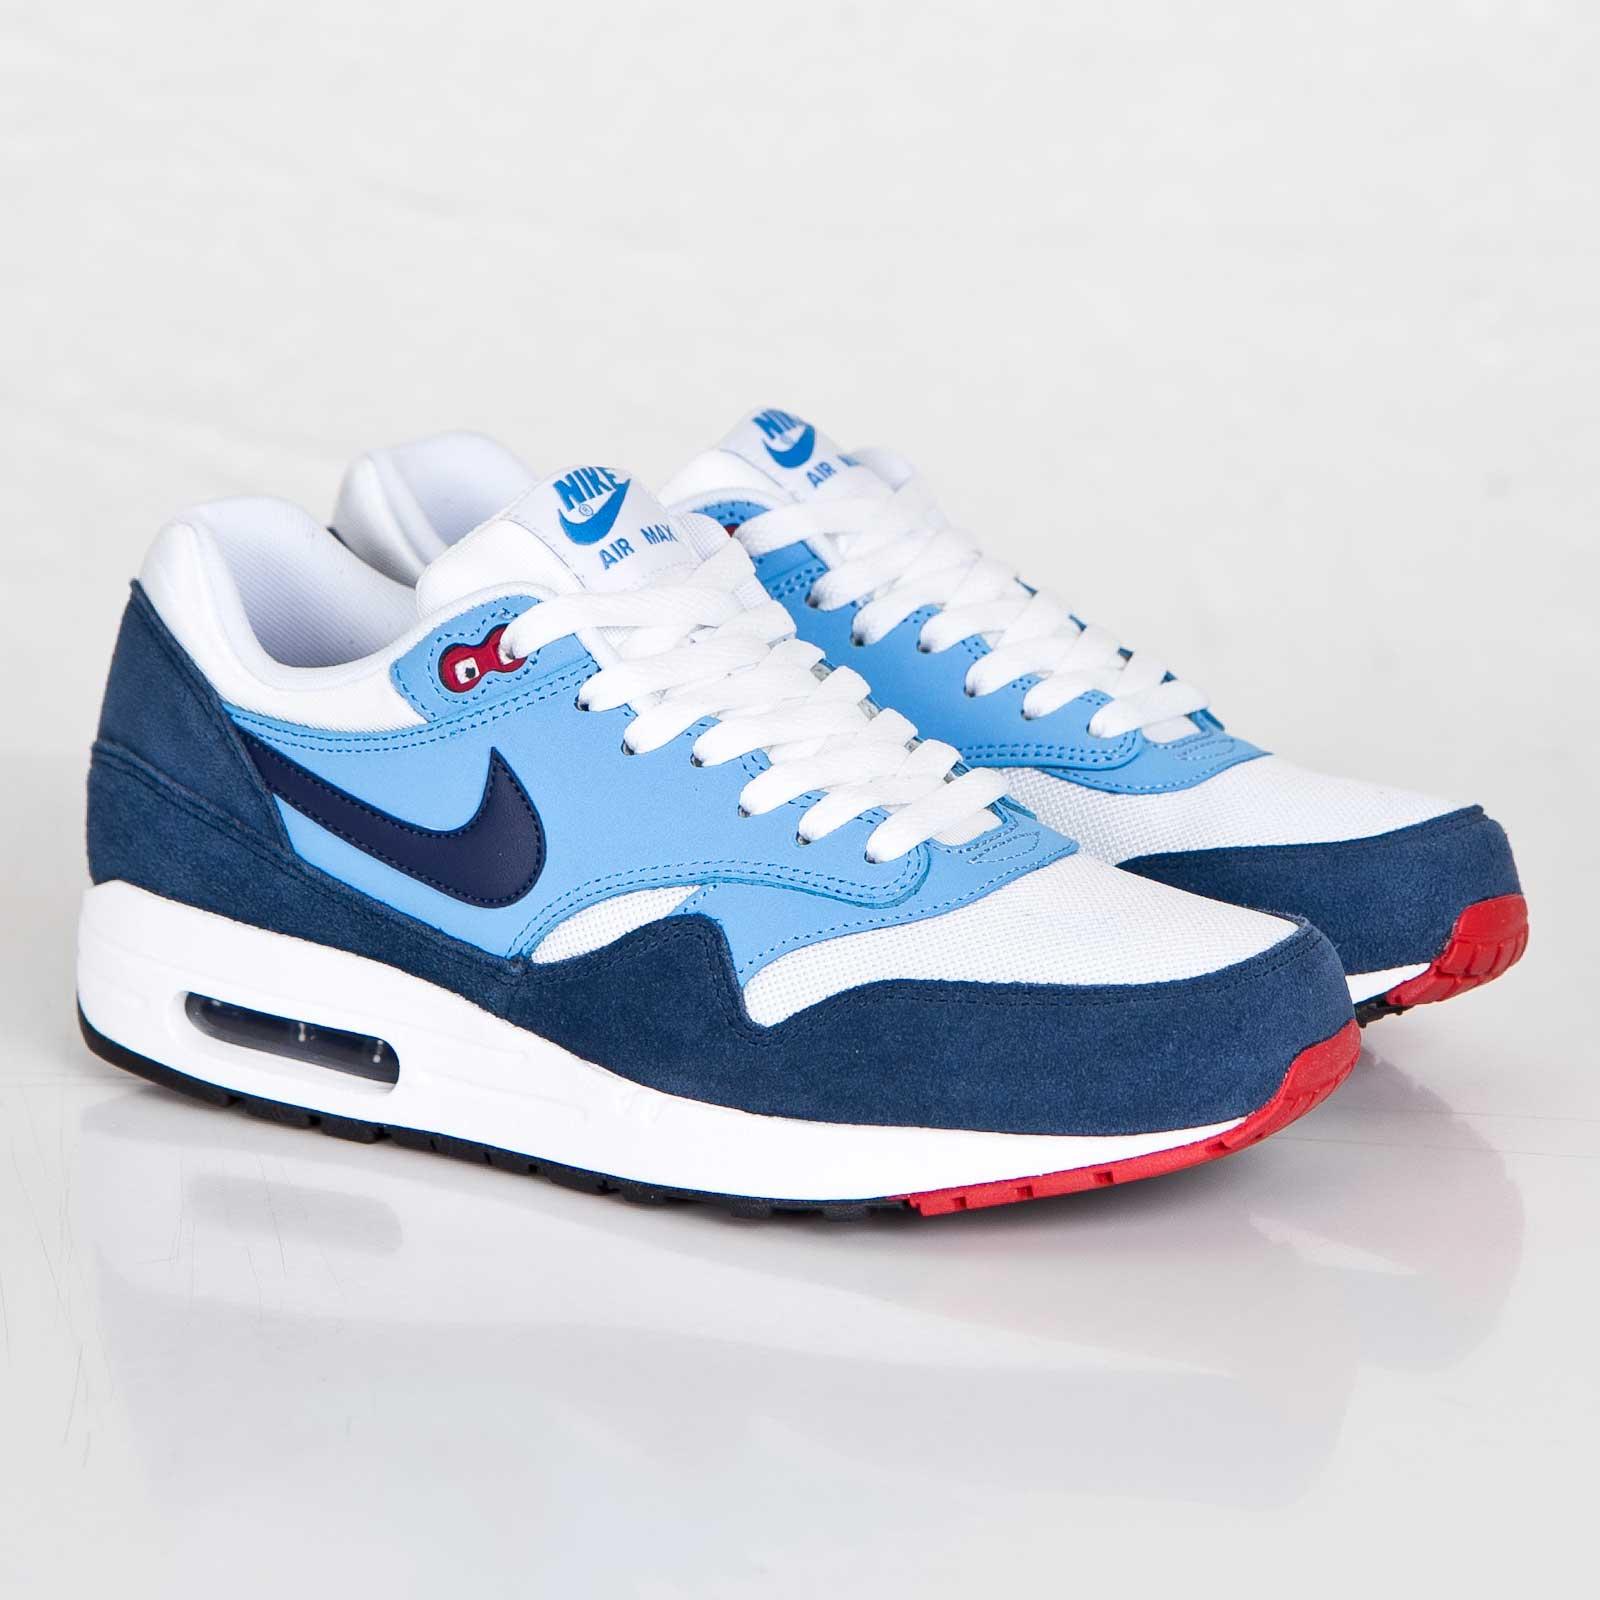 Nike Air Max 1 Essential 537383 119 Chaussuressnstuff ChaussuresEt